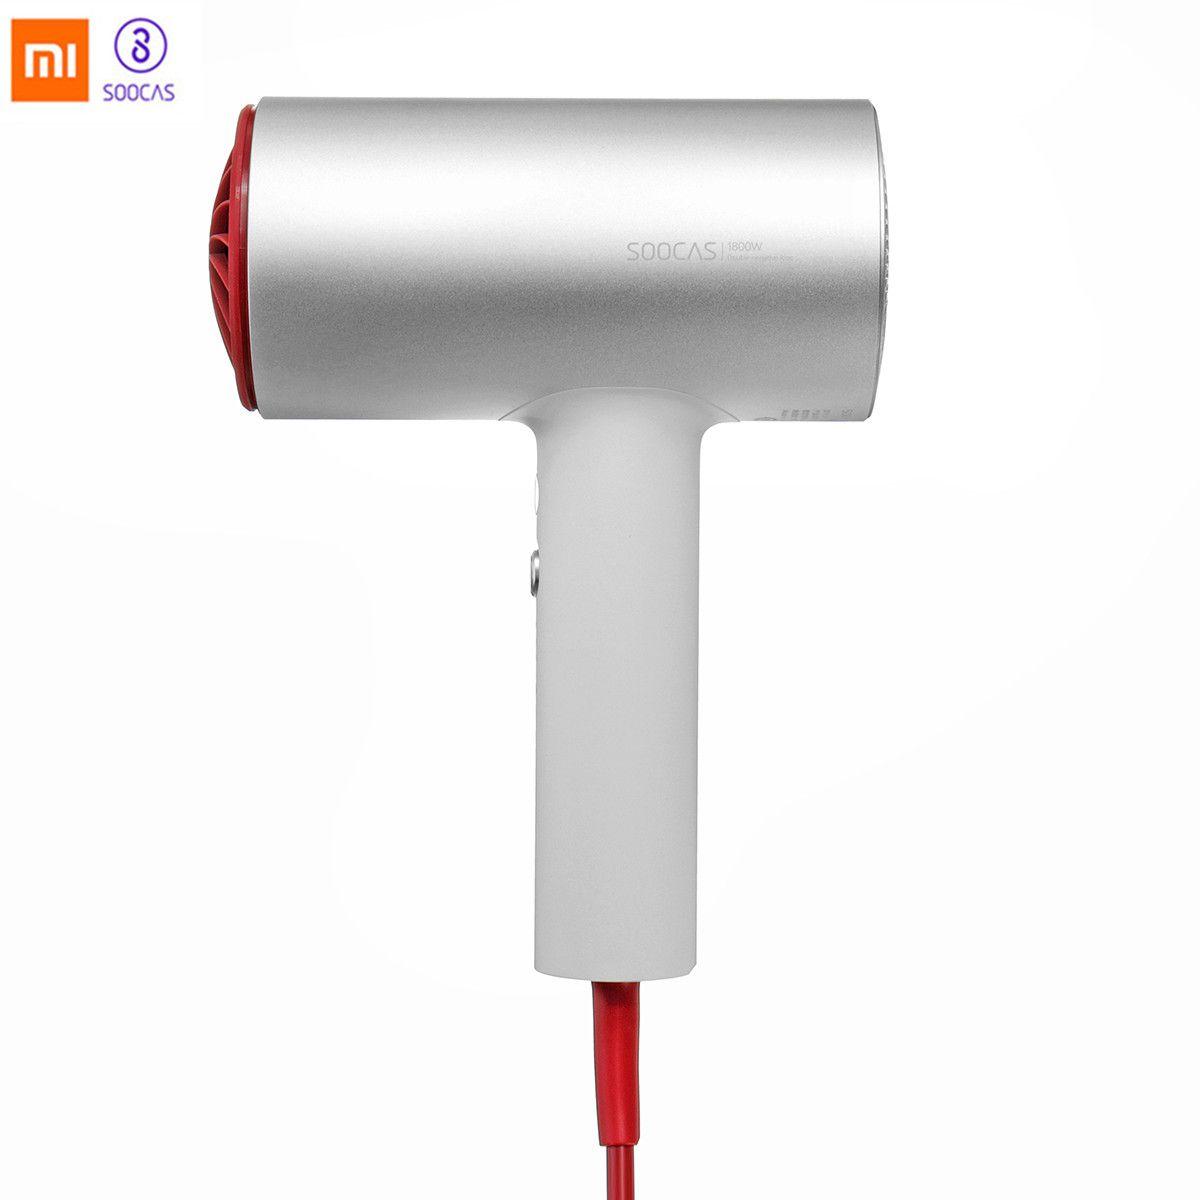 (International Version) Xiaomi Soocas H3 Original Anion Hair Dryer Quick-dry Hair Tools 1800W Air Outlet Anti-Hot Innovative EU